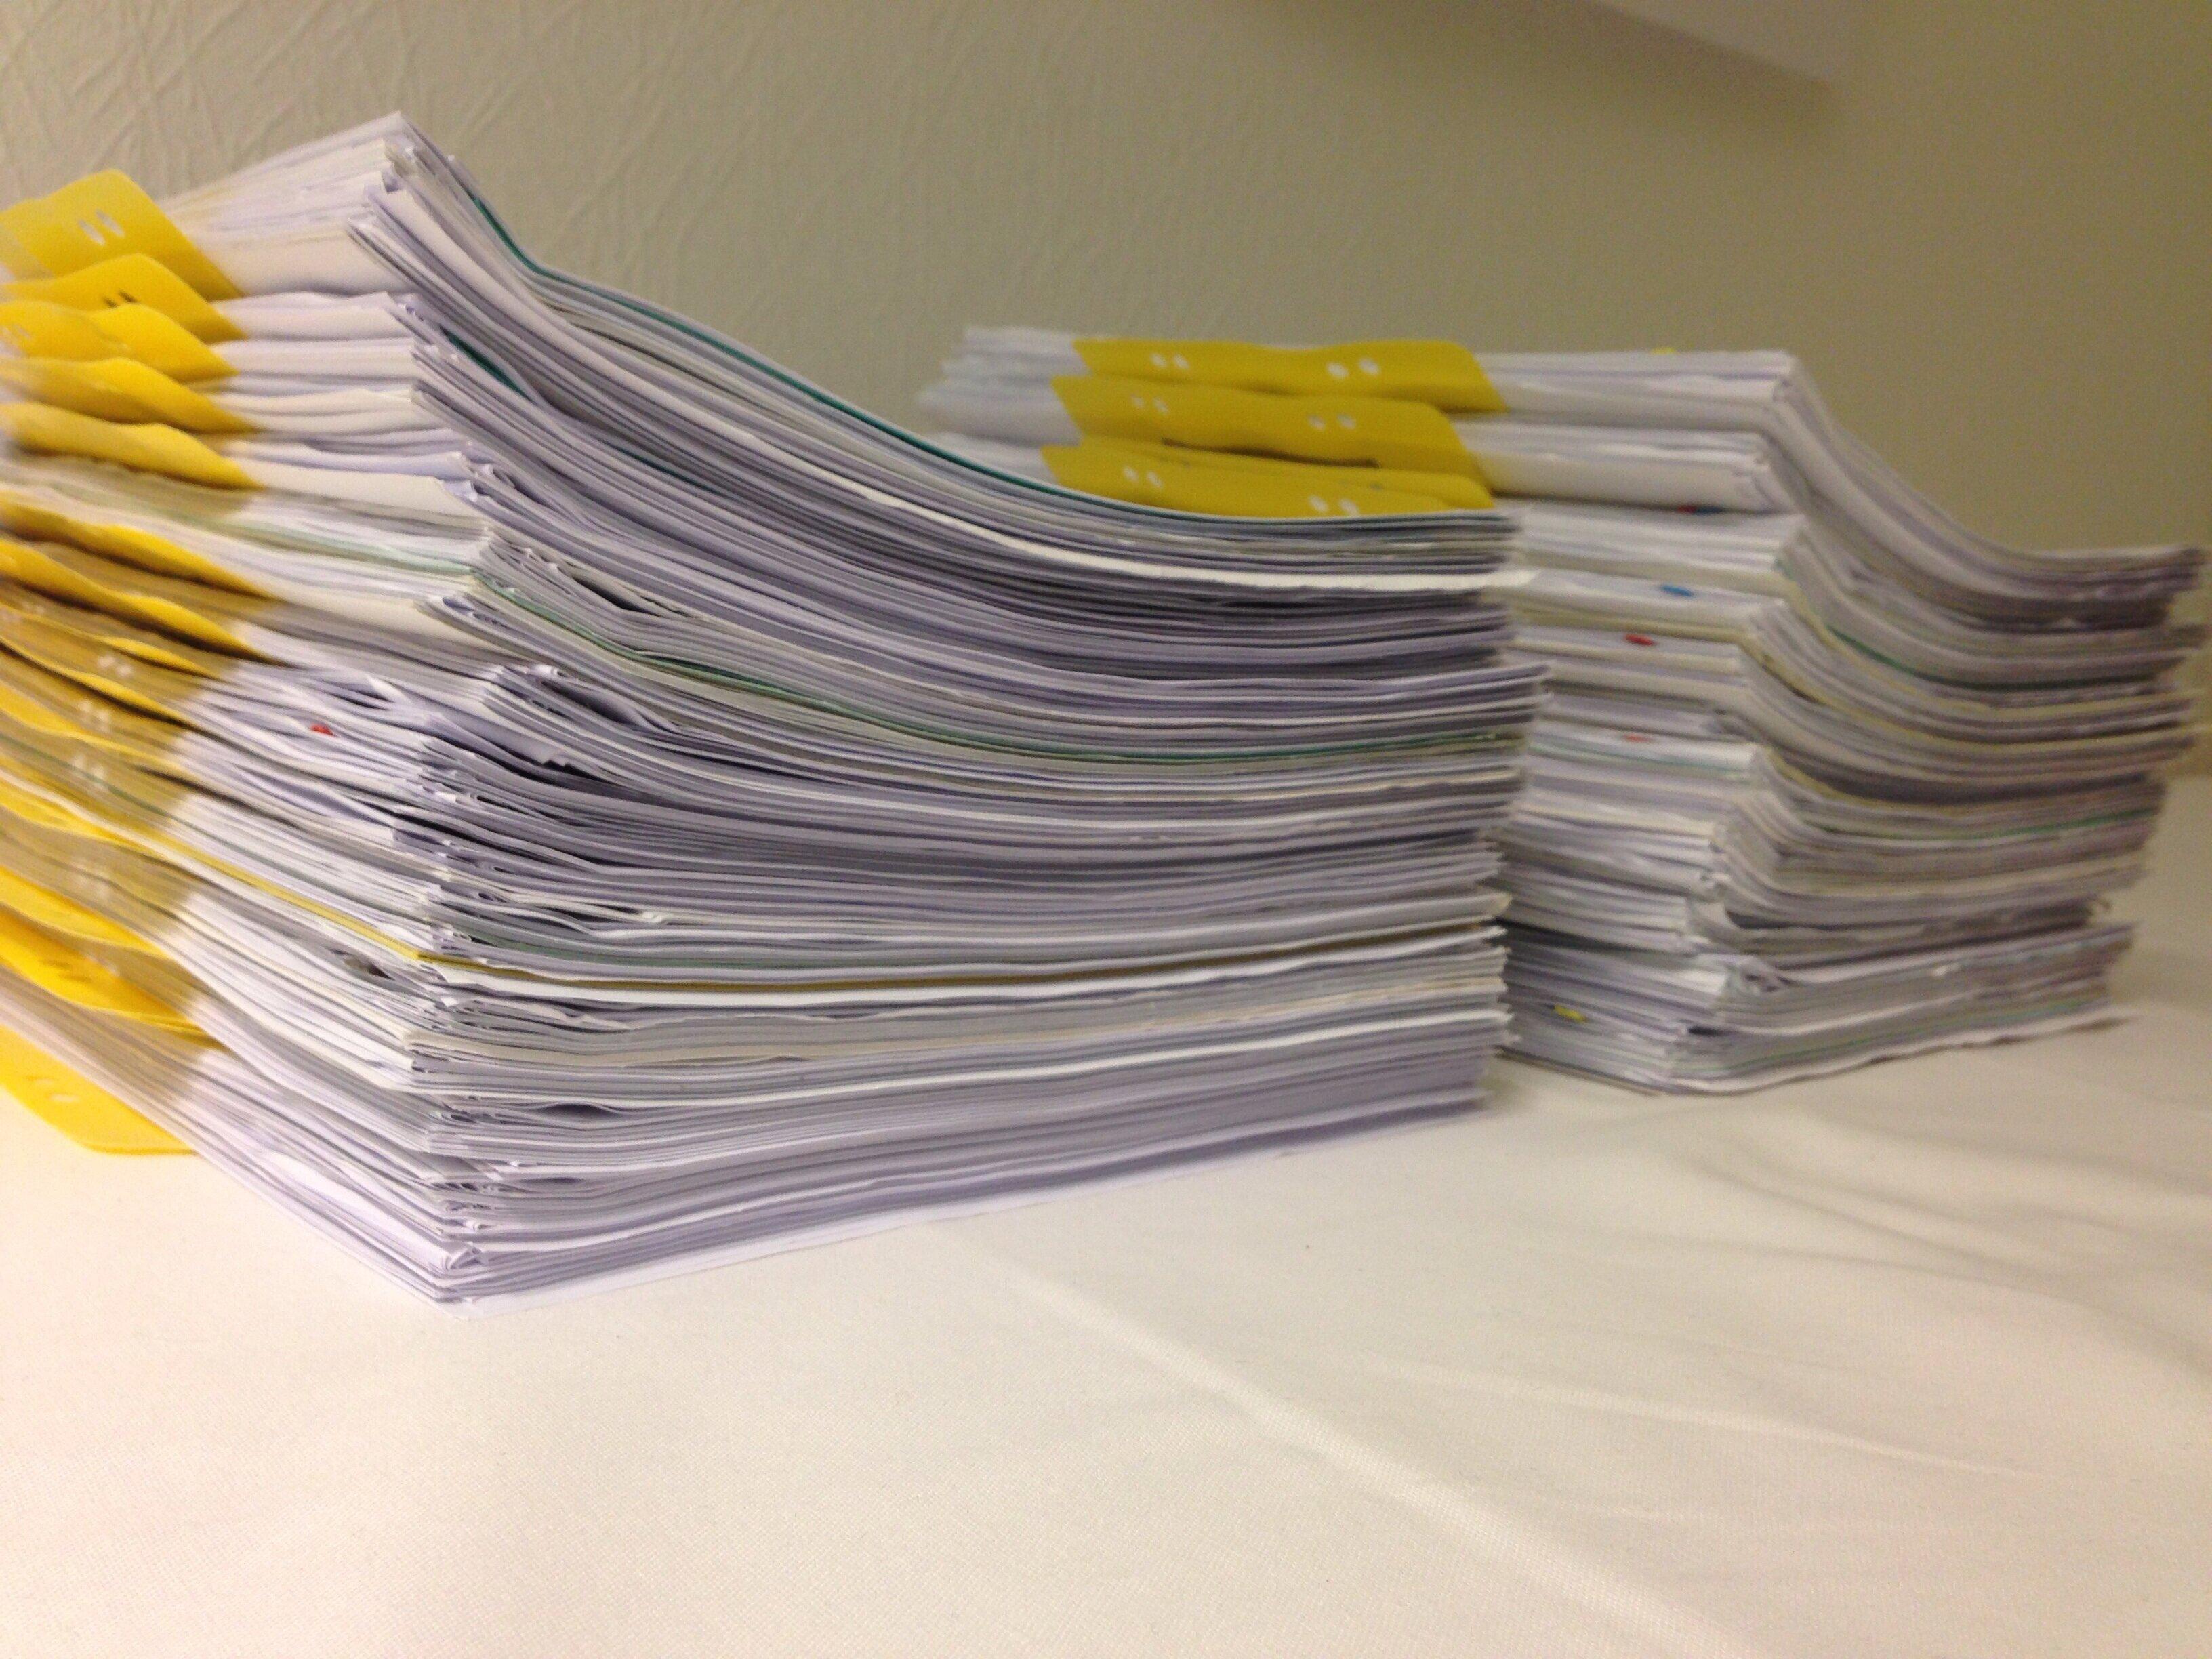 Изображение - Правоустанавливающие документы на квартиру wire-office-paper-material-interior-design-product-958097-pxhere.com_